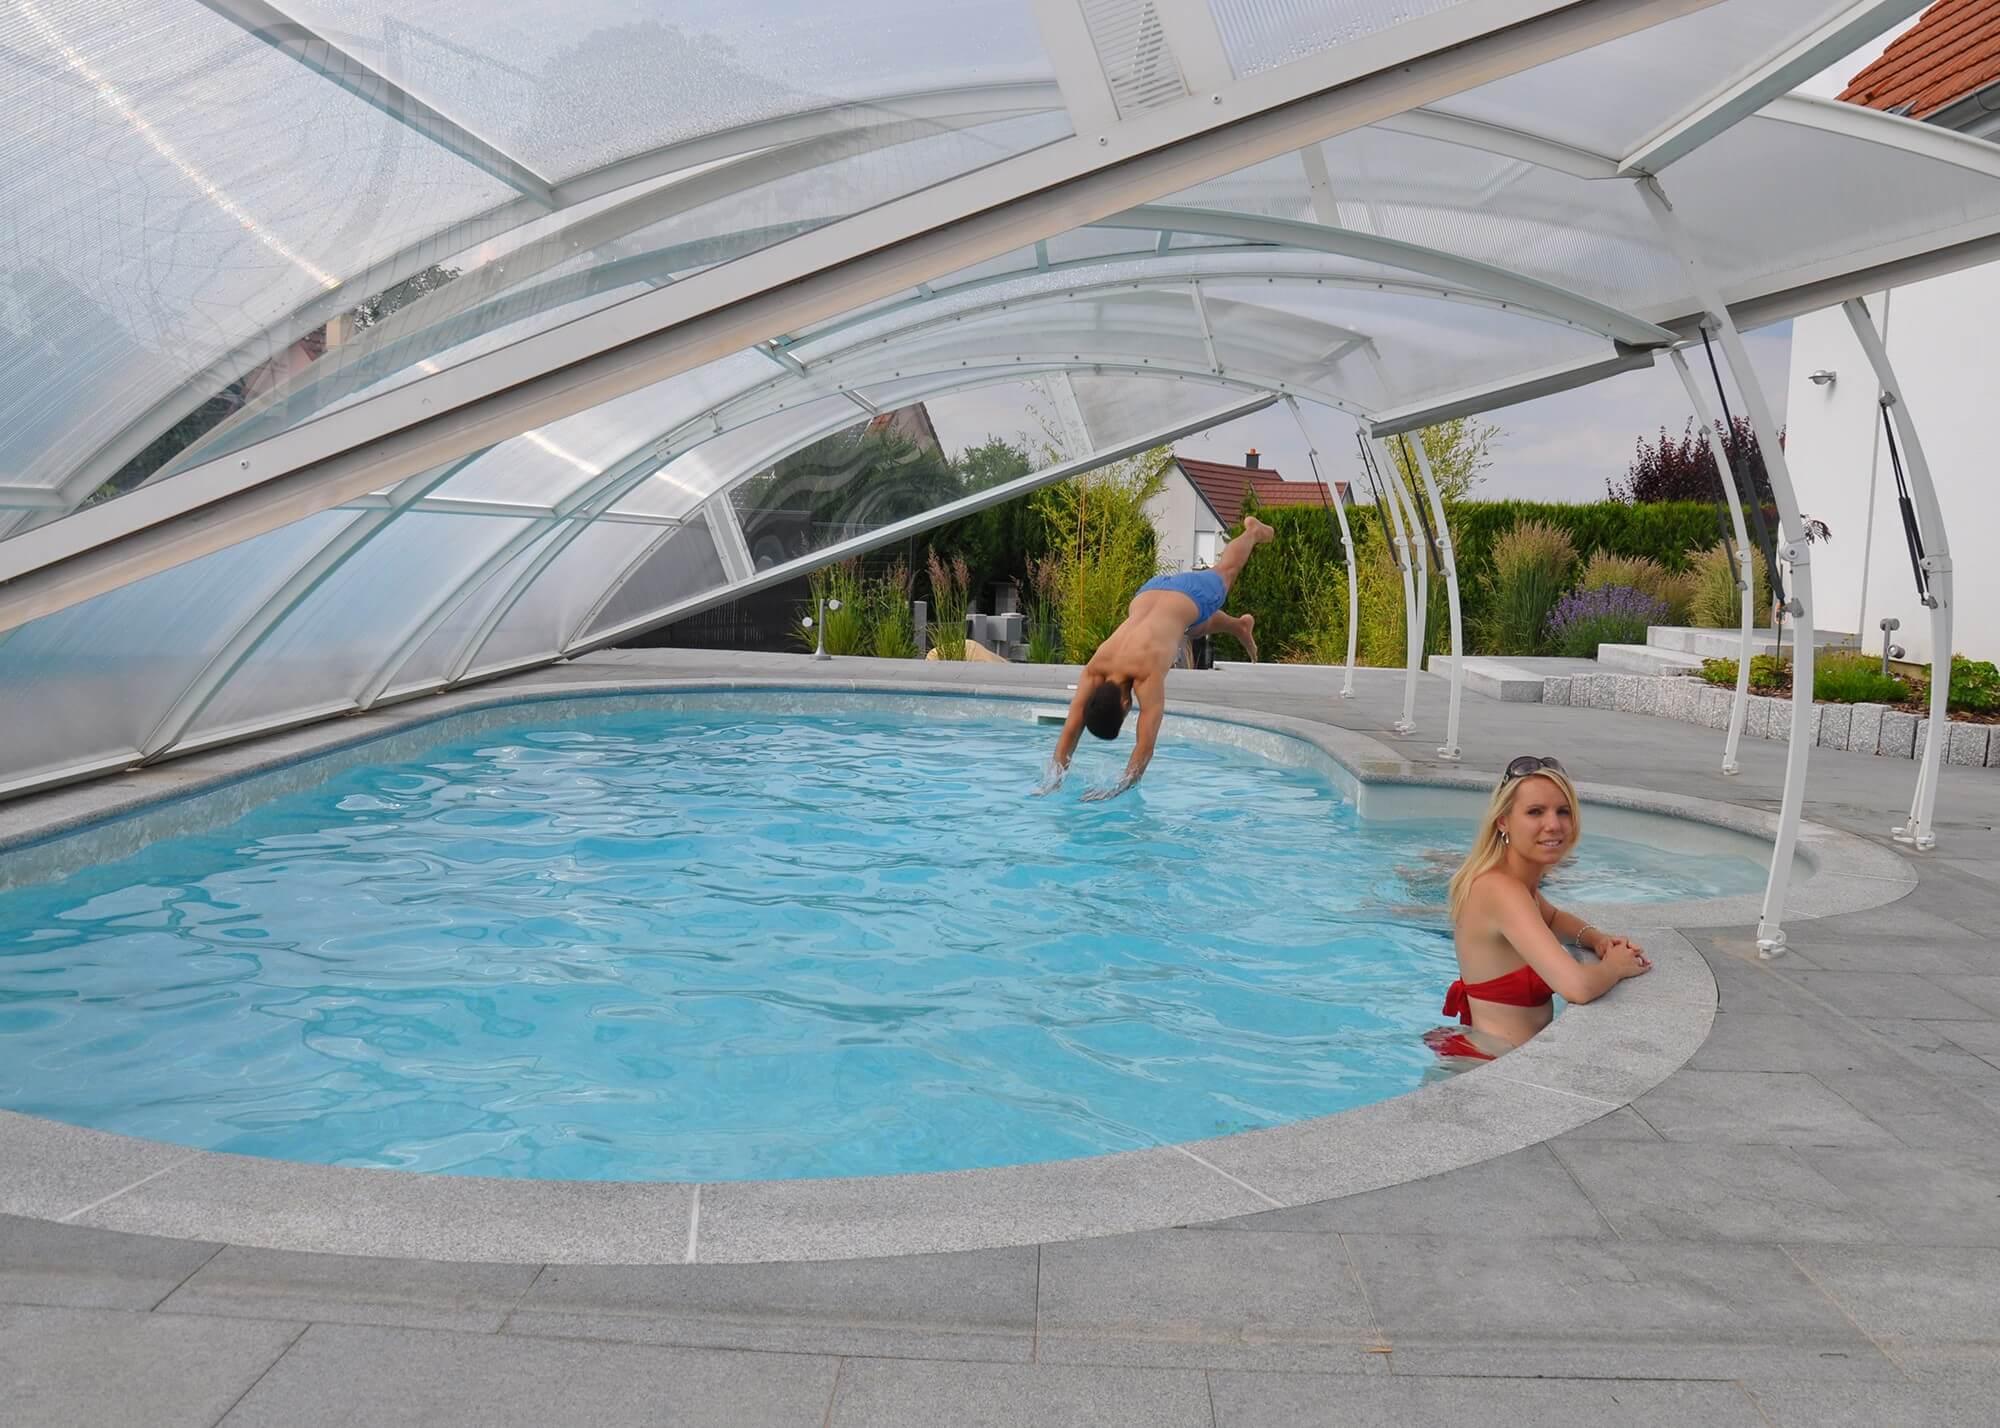 Abri amovible pour piscine piscines waterair for Piscine amovible